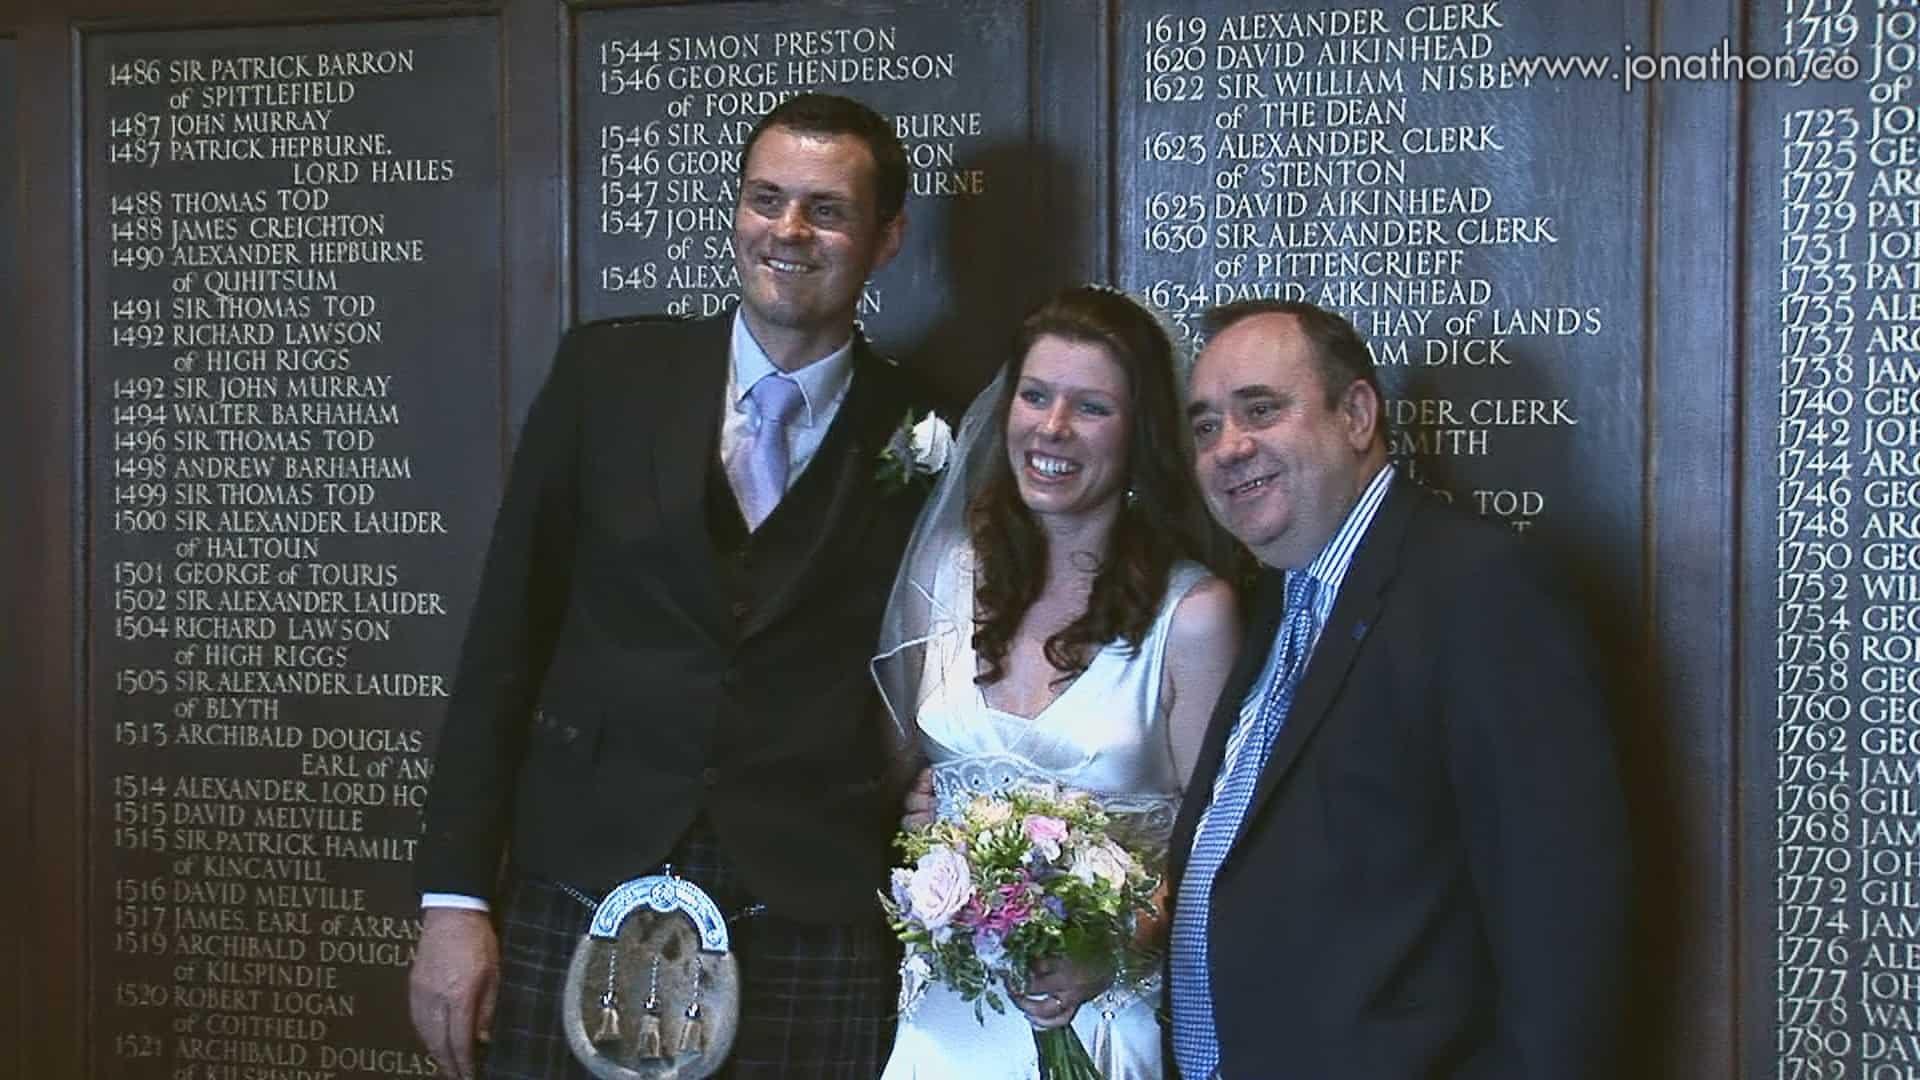 Alex Salmond wedding visit